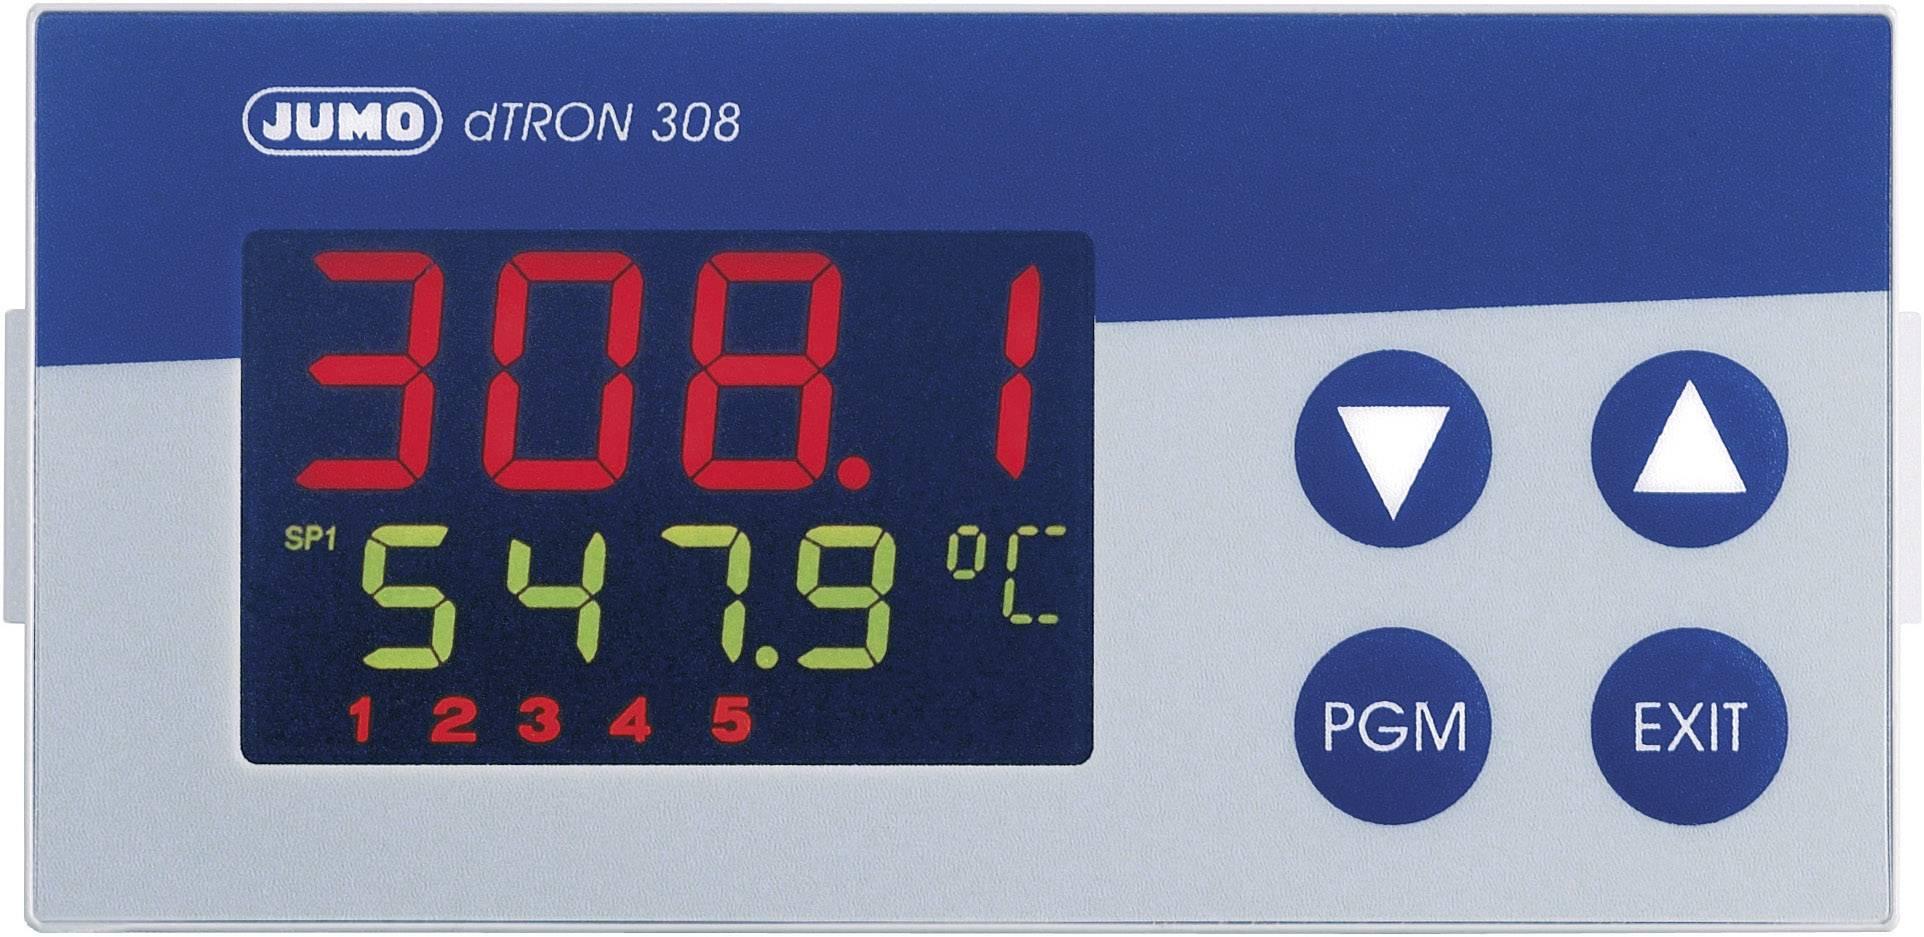 Kompaktný trojstupňový modulačný termostat Jumo DTRON308